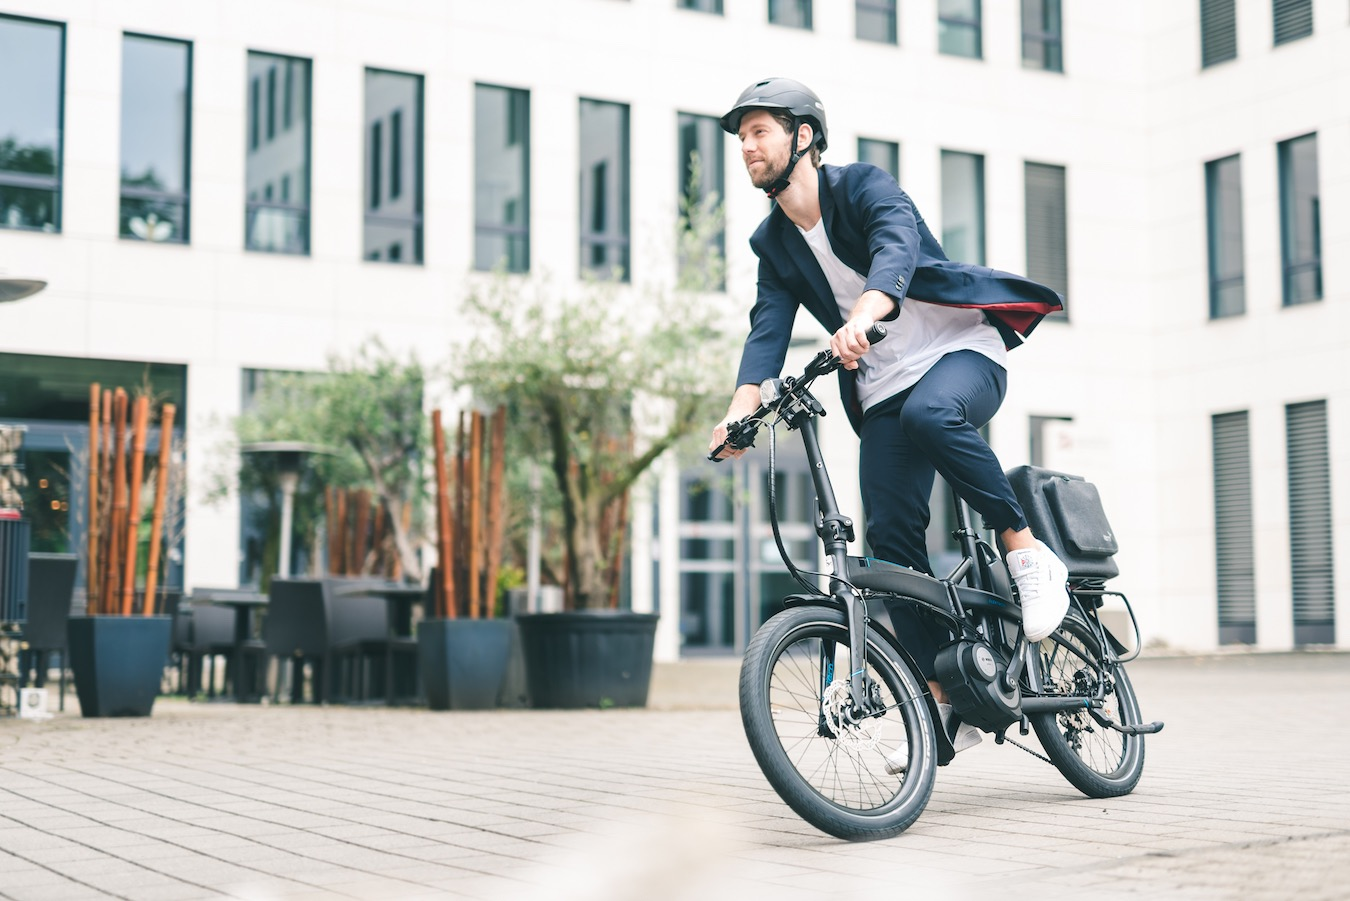 E bike driver